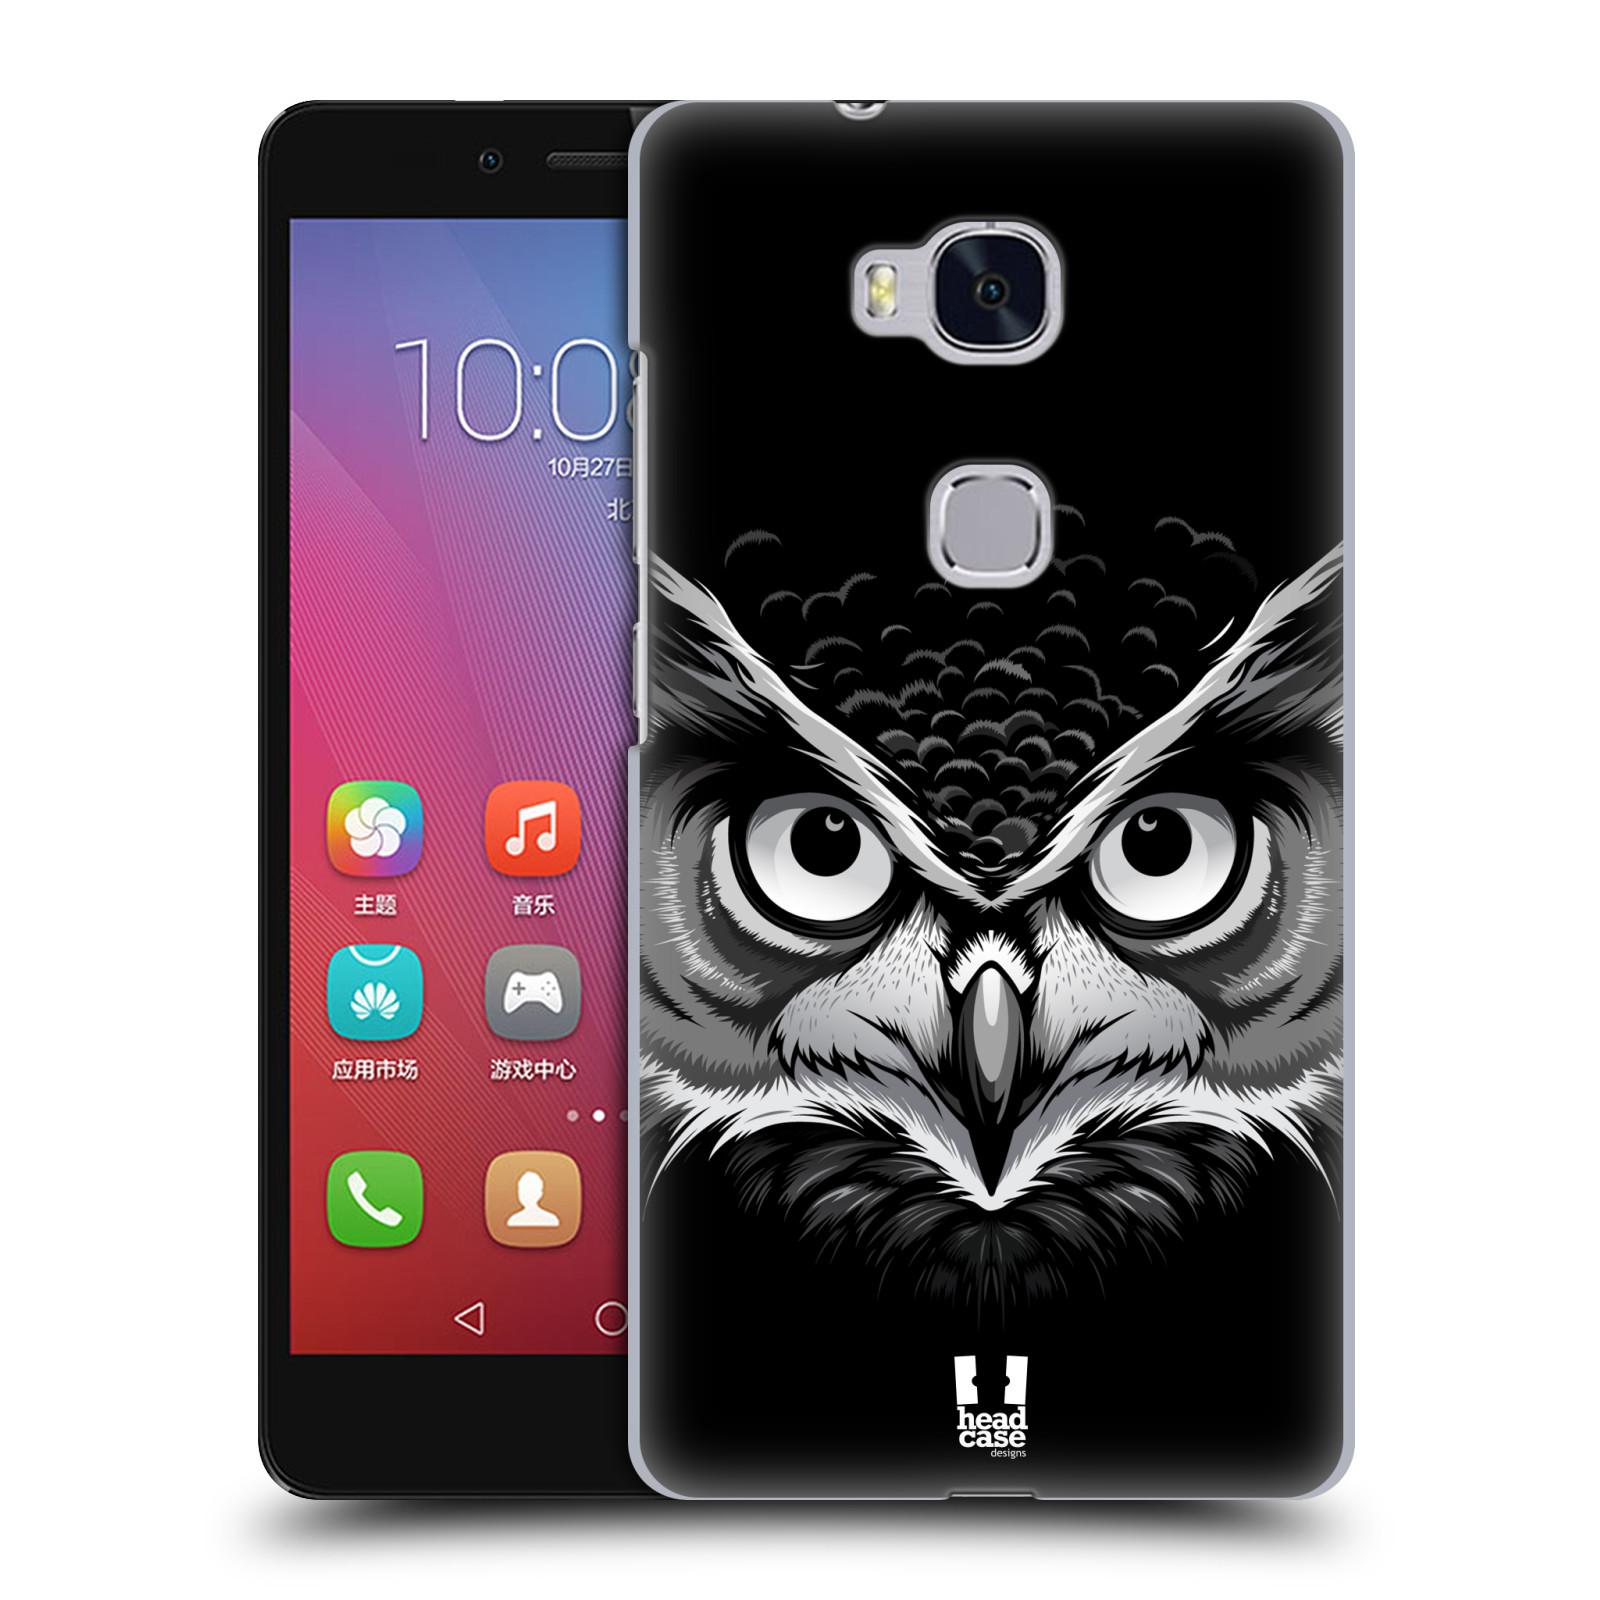 HEAD CASE pevný plastový obal na mobil HUAWEI HONOR 5X vzor Zvíře kreslená tvář 2 sova